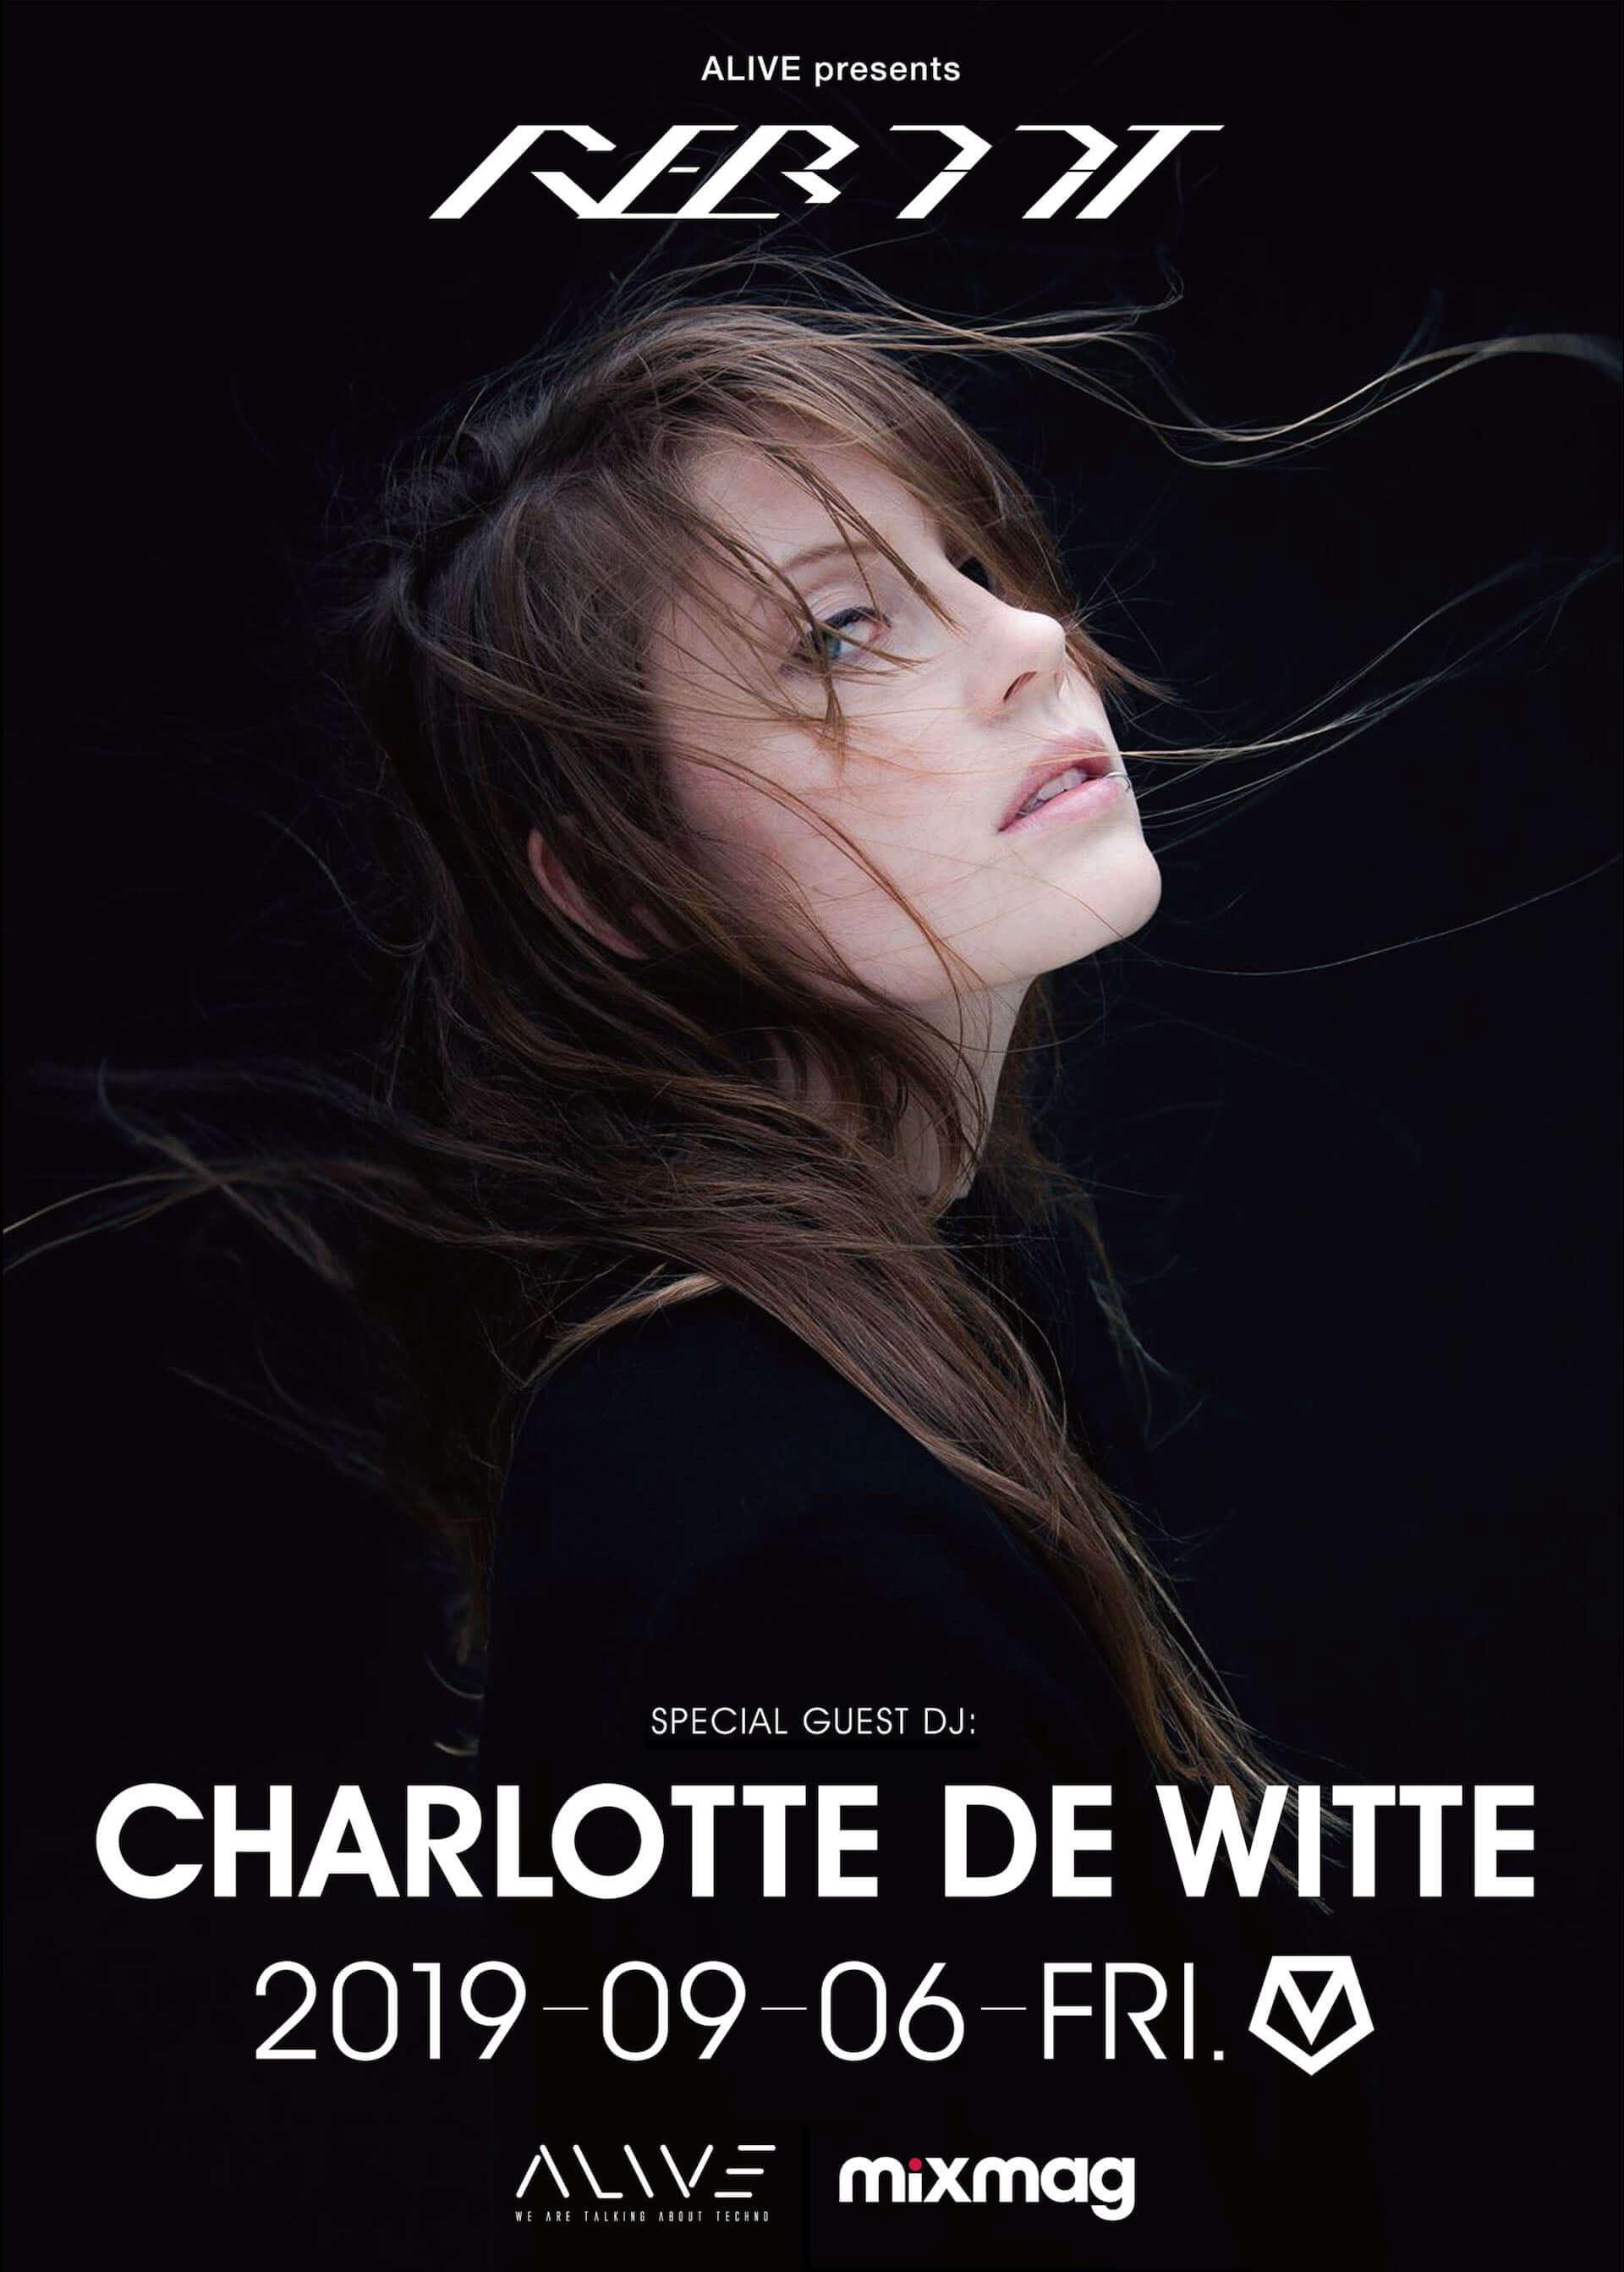 Tomorrowlandにも出演のフィメール・テクノDJ、Charlotte de Witteが再来日! music190730_charlottedewitte_1-1920x2686